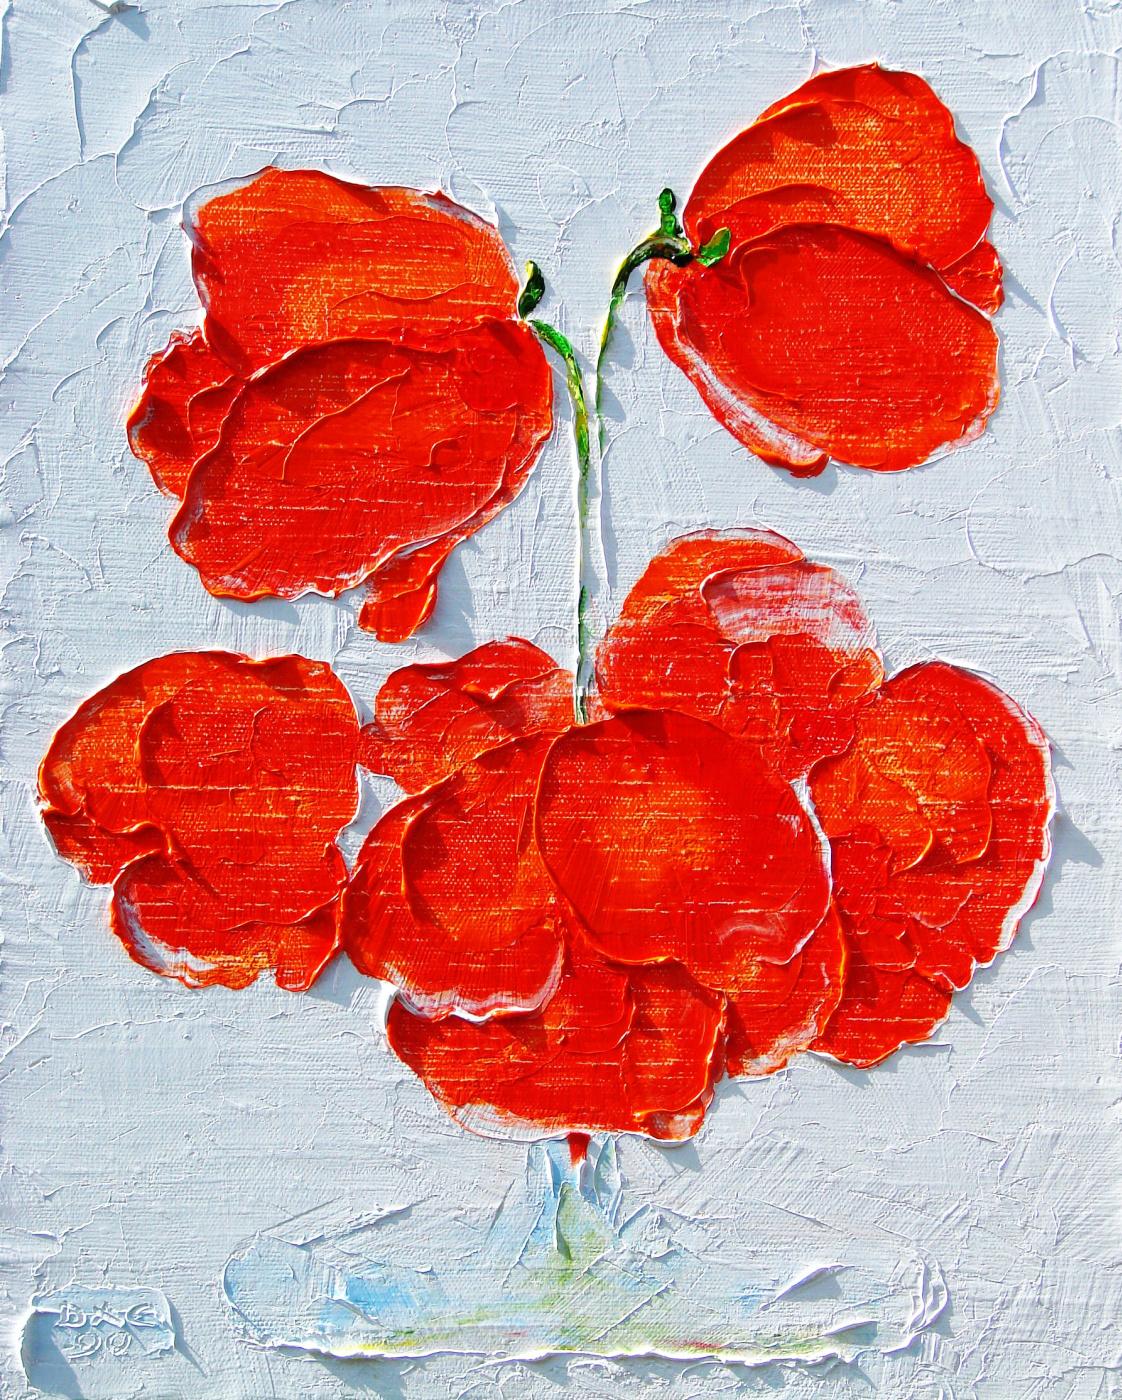 Kandinsky-DAE. Poppies. Oil on canvas, 50-40, 2006.